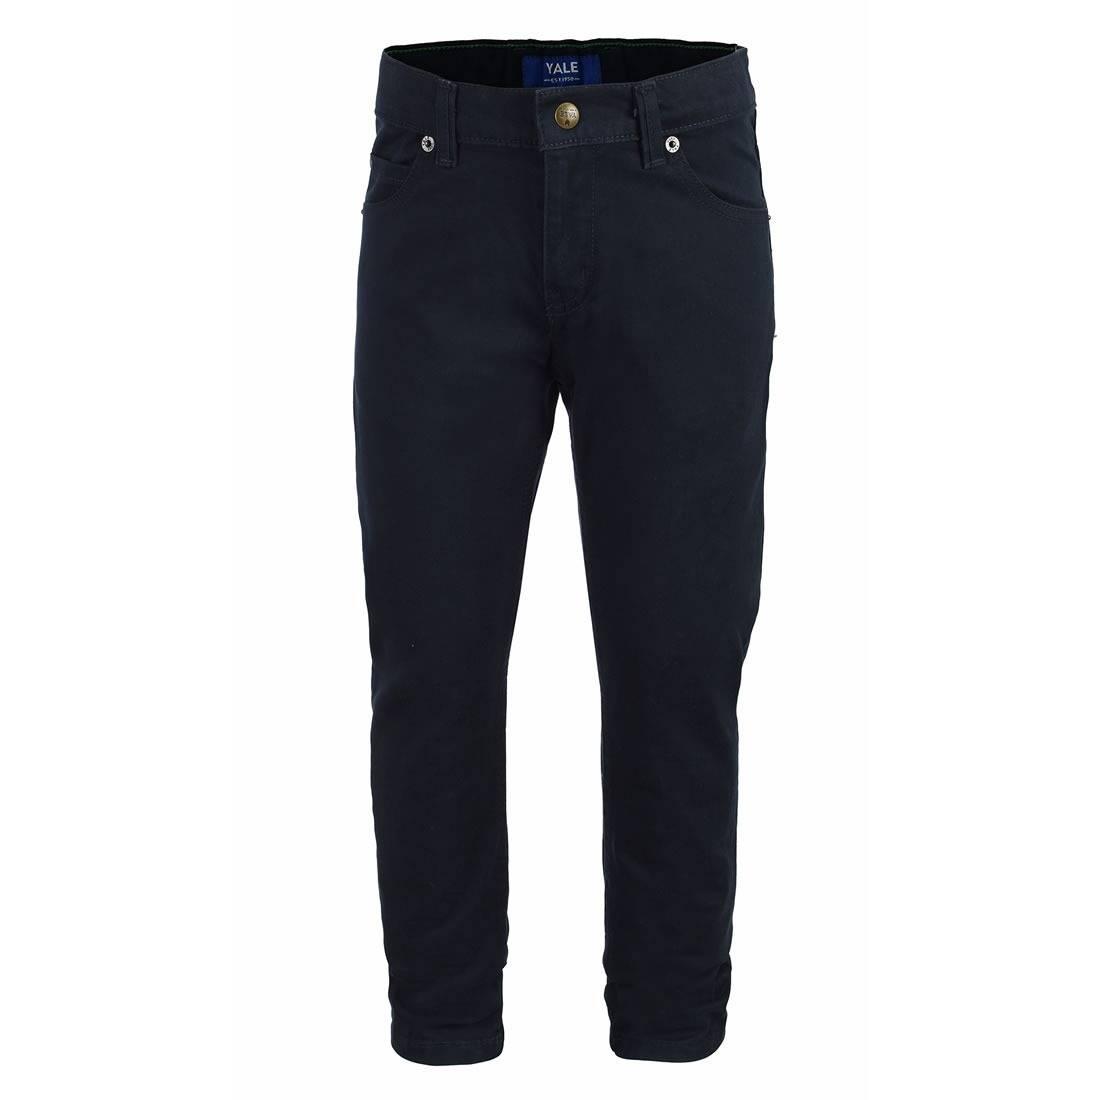 021109065419-01-Pantalon-Vaquero-Boys-Gabardina-Con-Elastano-Skinny-Fit-Cintura-Ajustable-Marino-yale